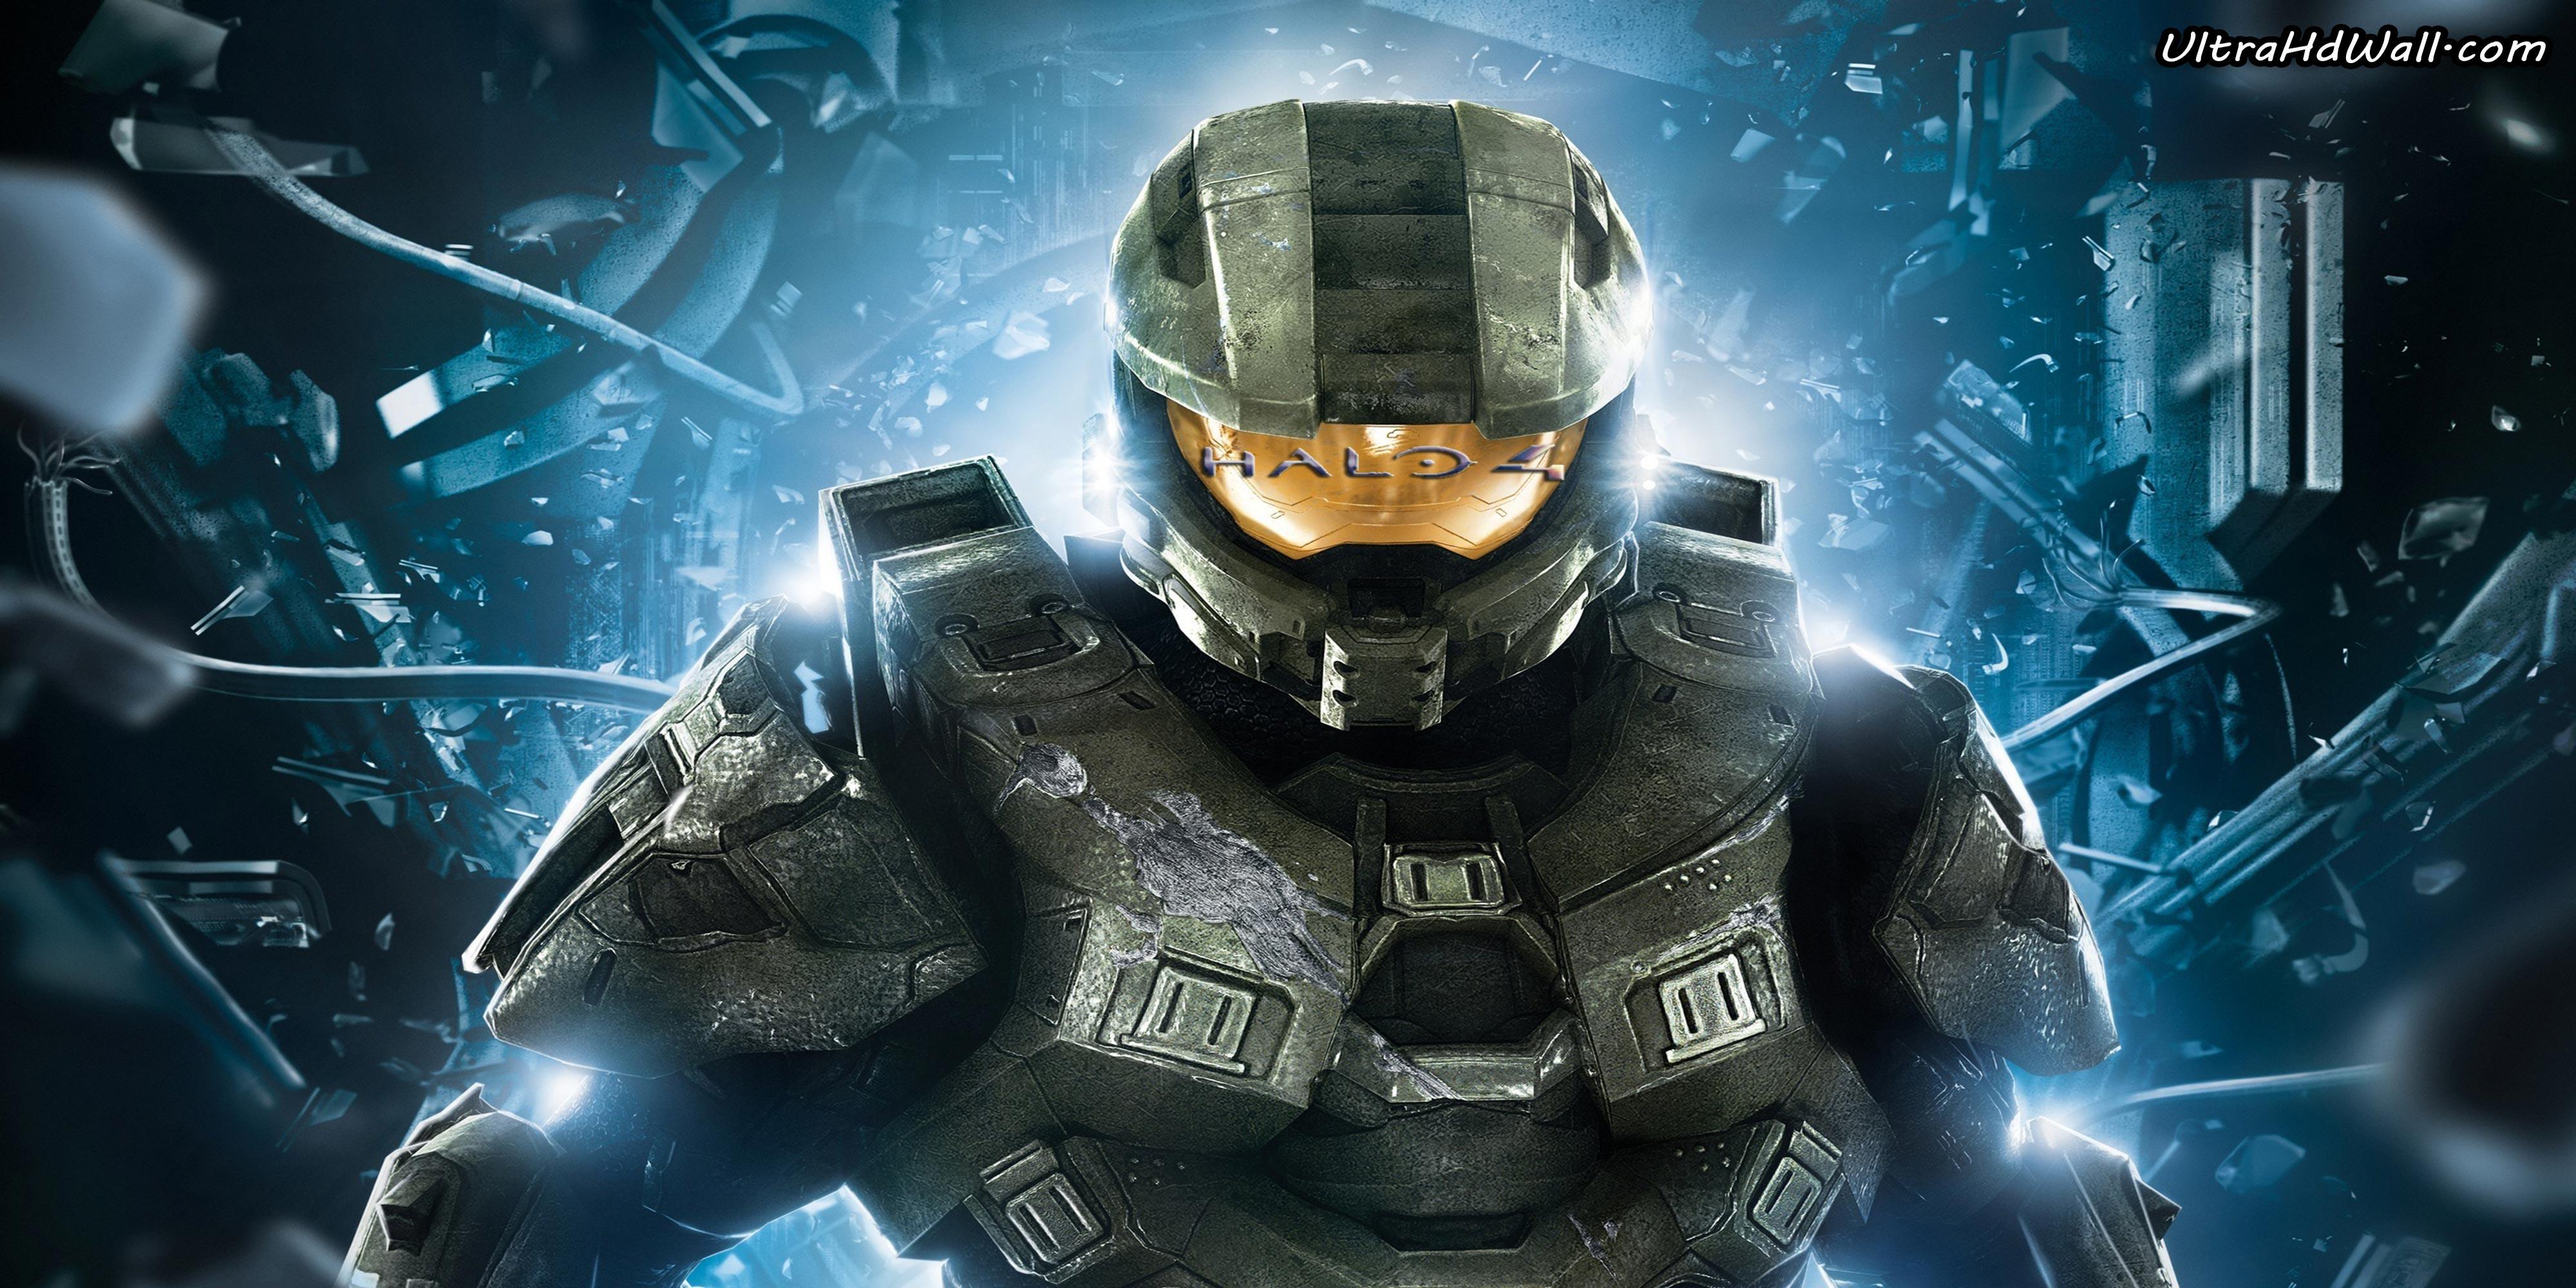 Halo 4 Wallpaper 4000x2000